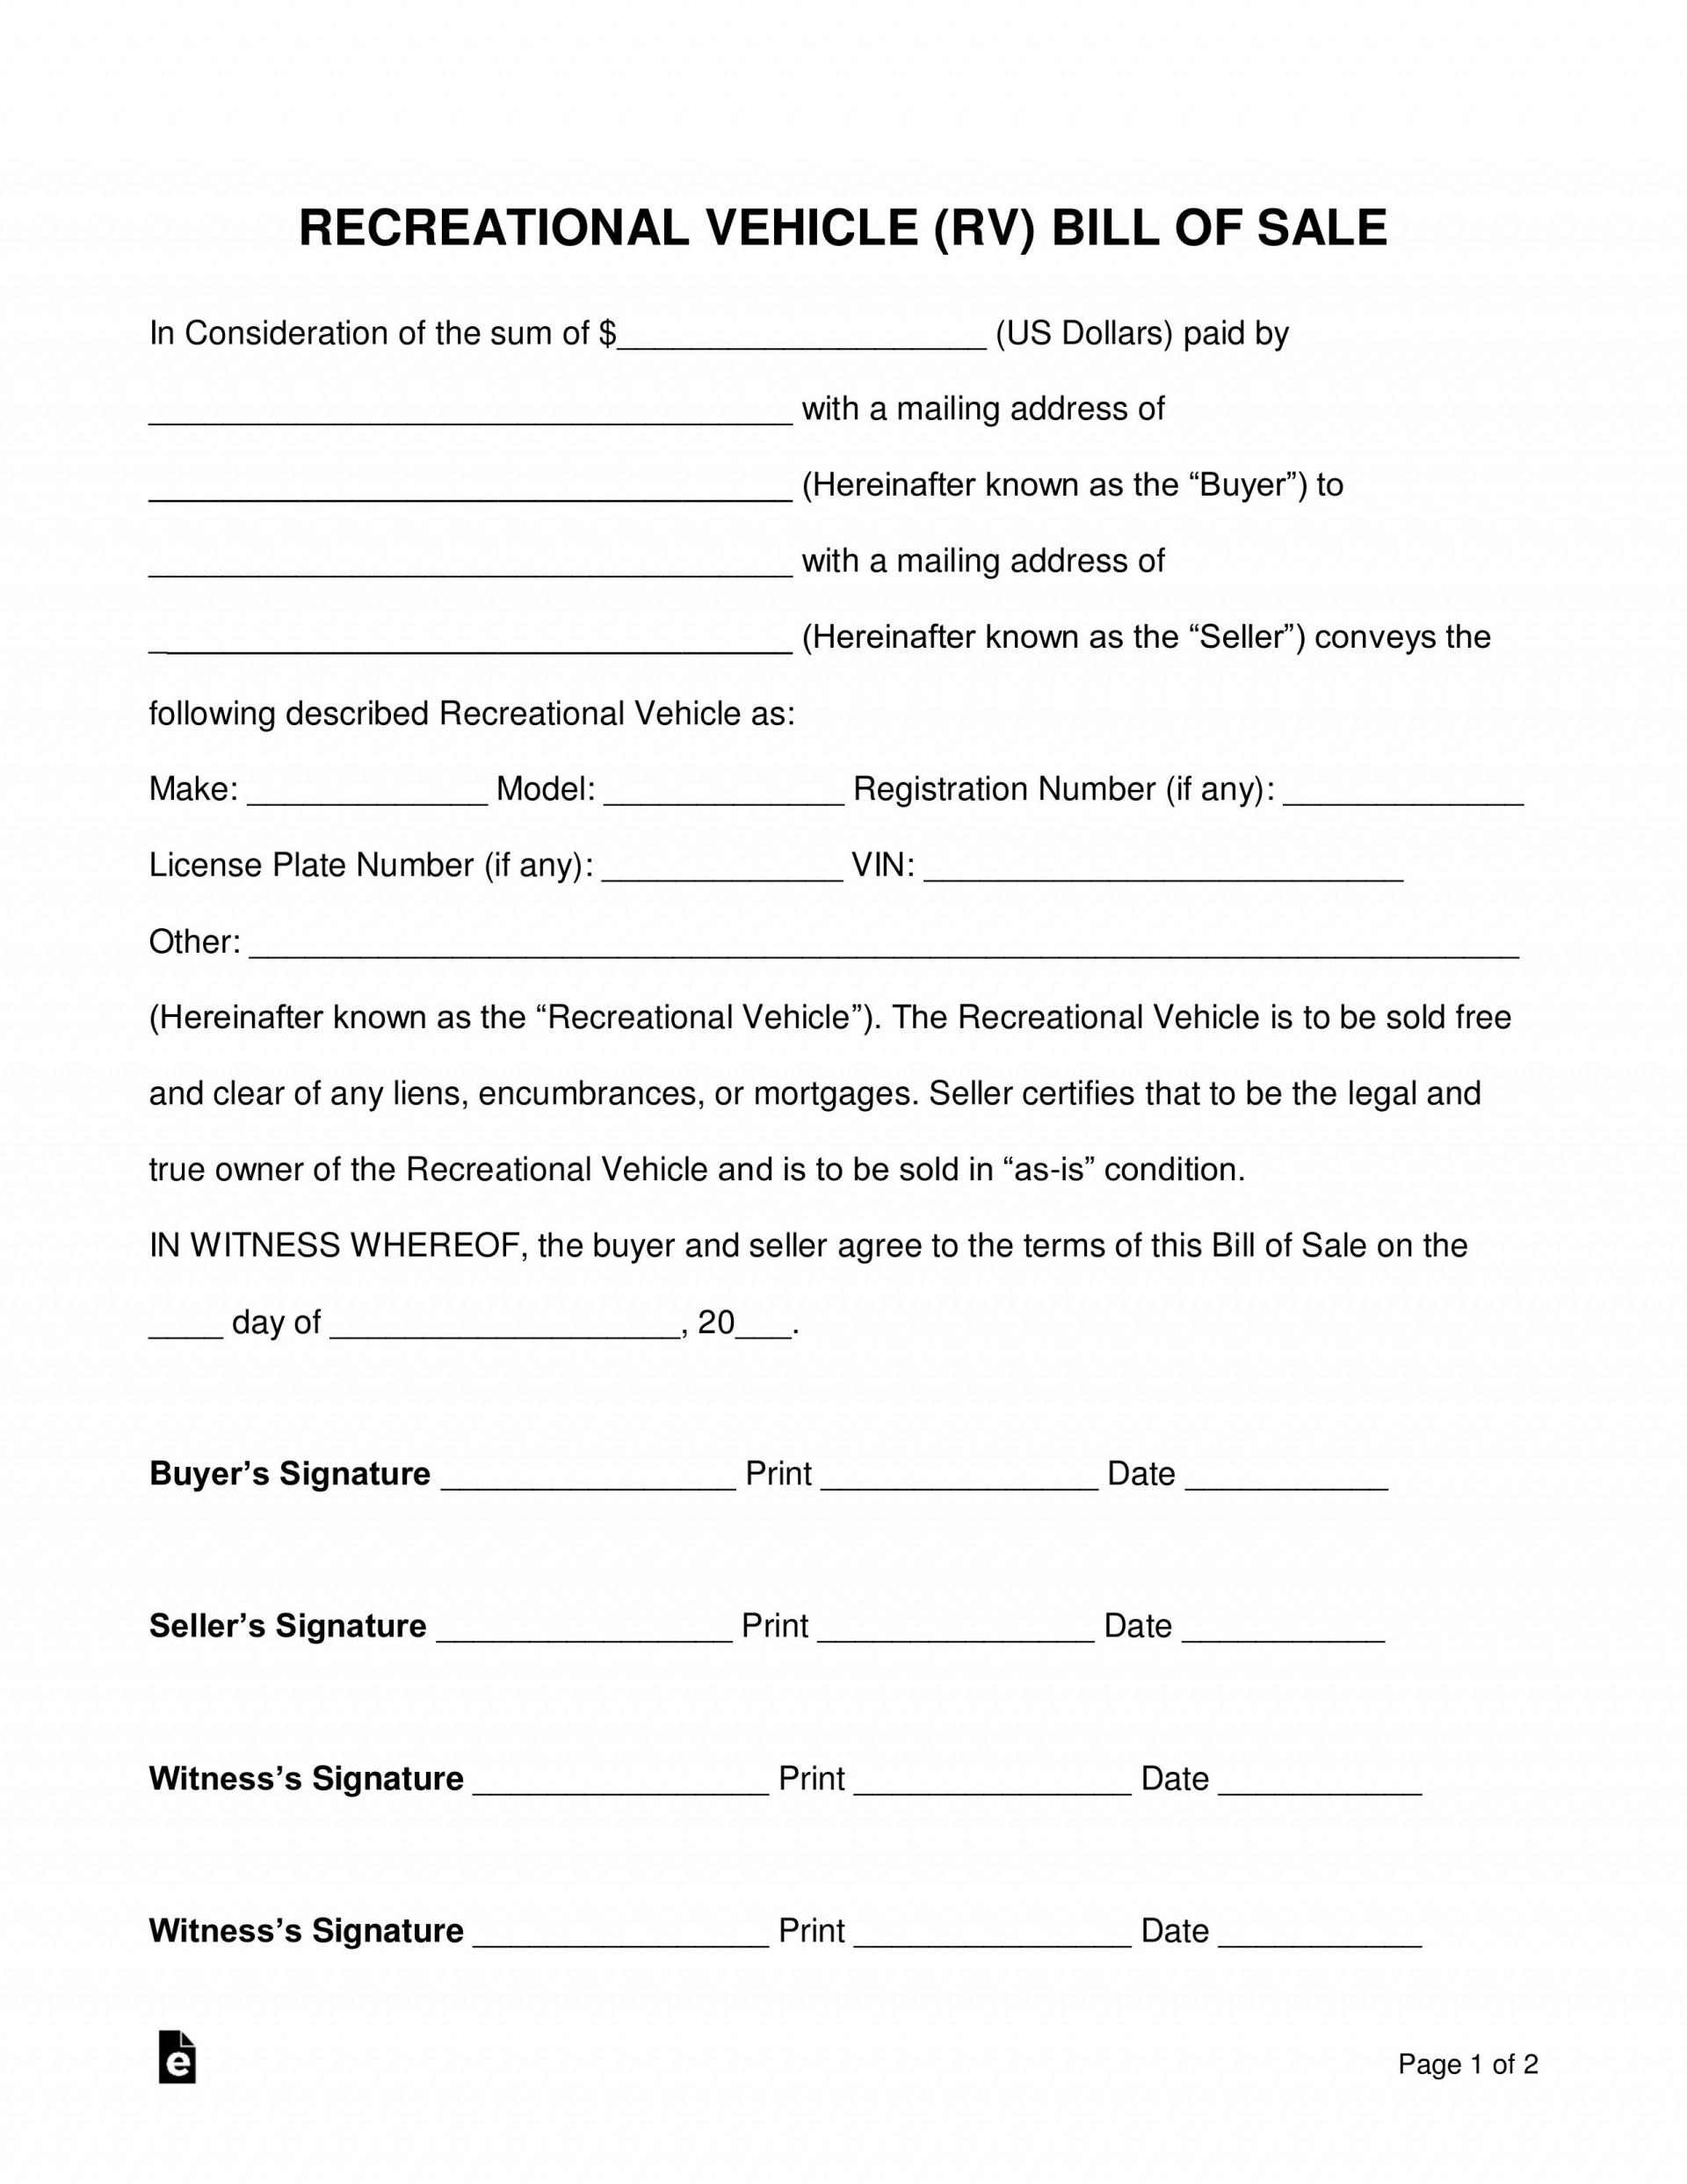 005 Frightening Bill Of Sale Template Texa Design  Texas Free Car Form Dmv Document1920